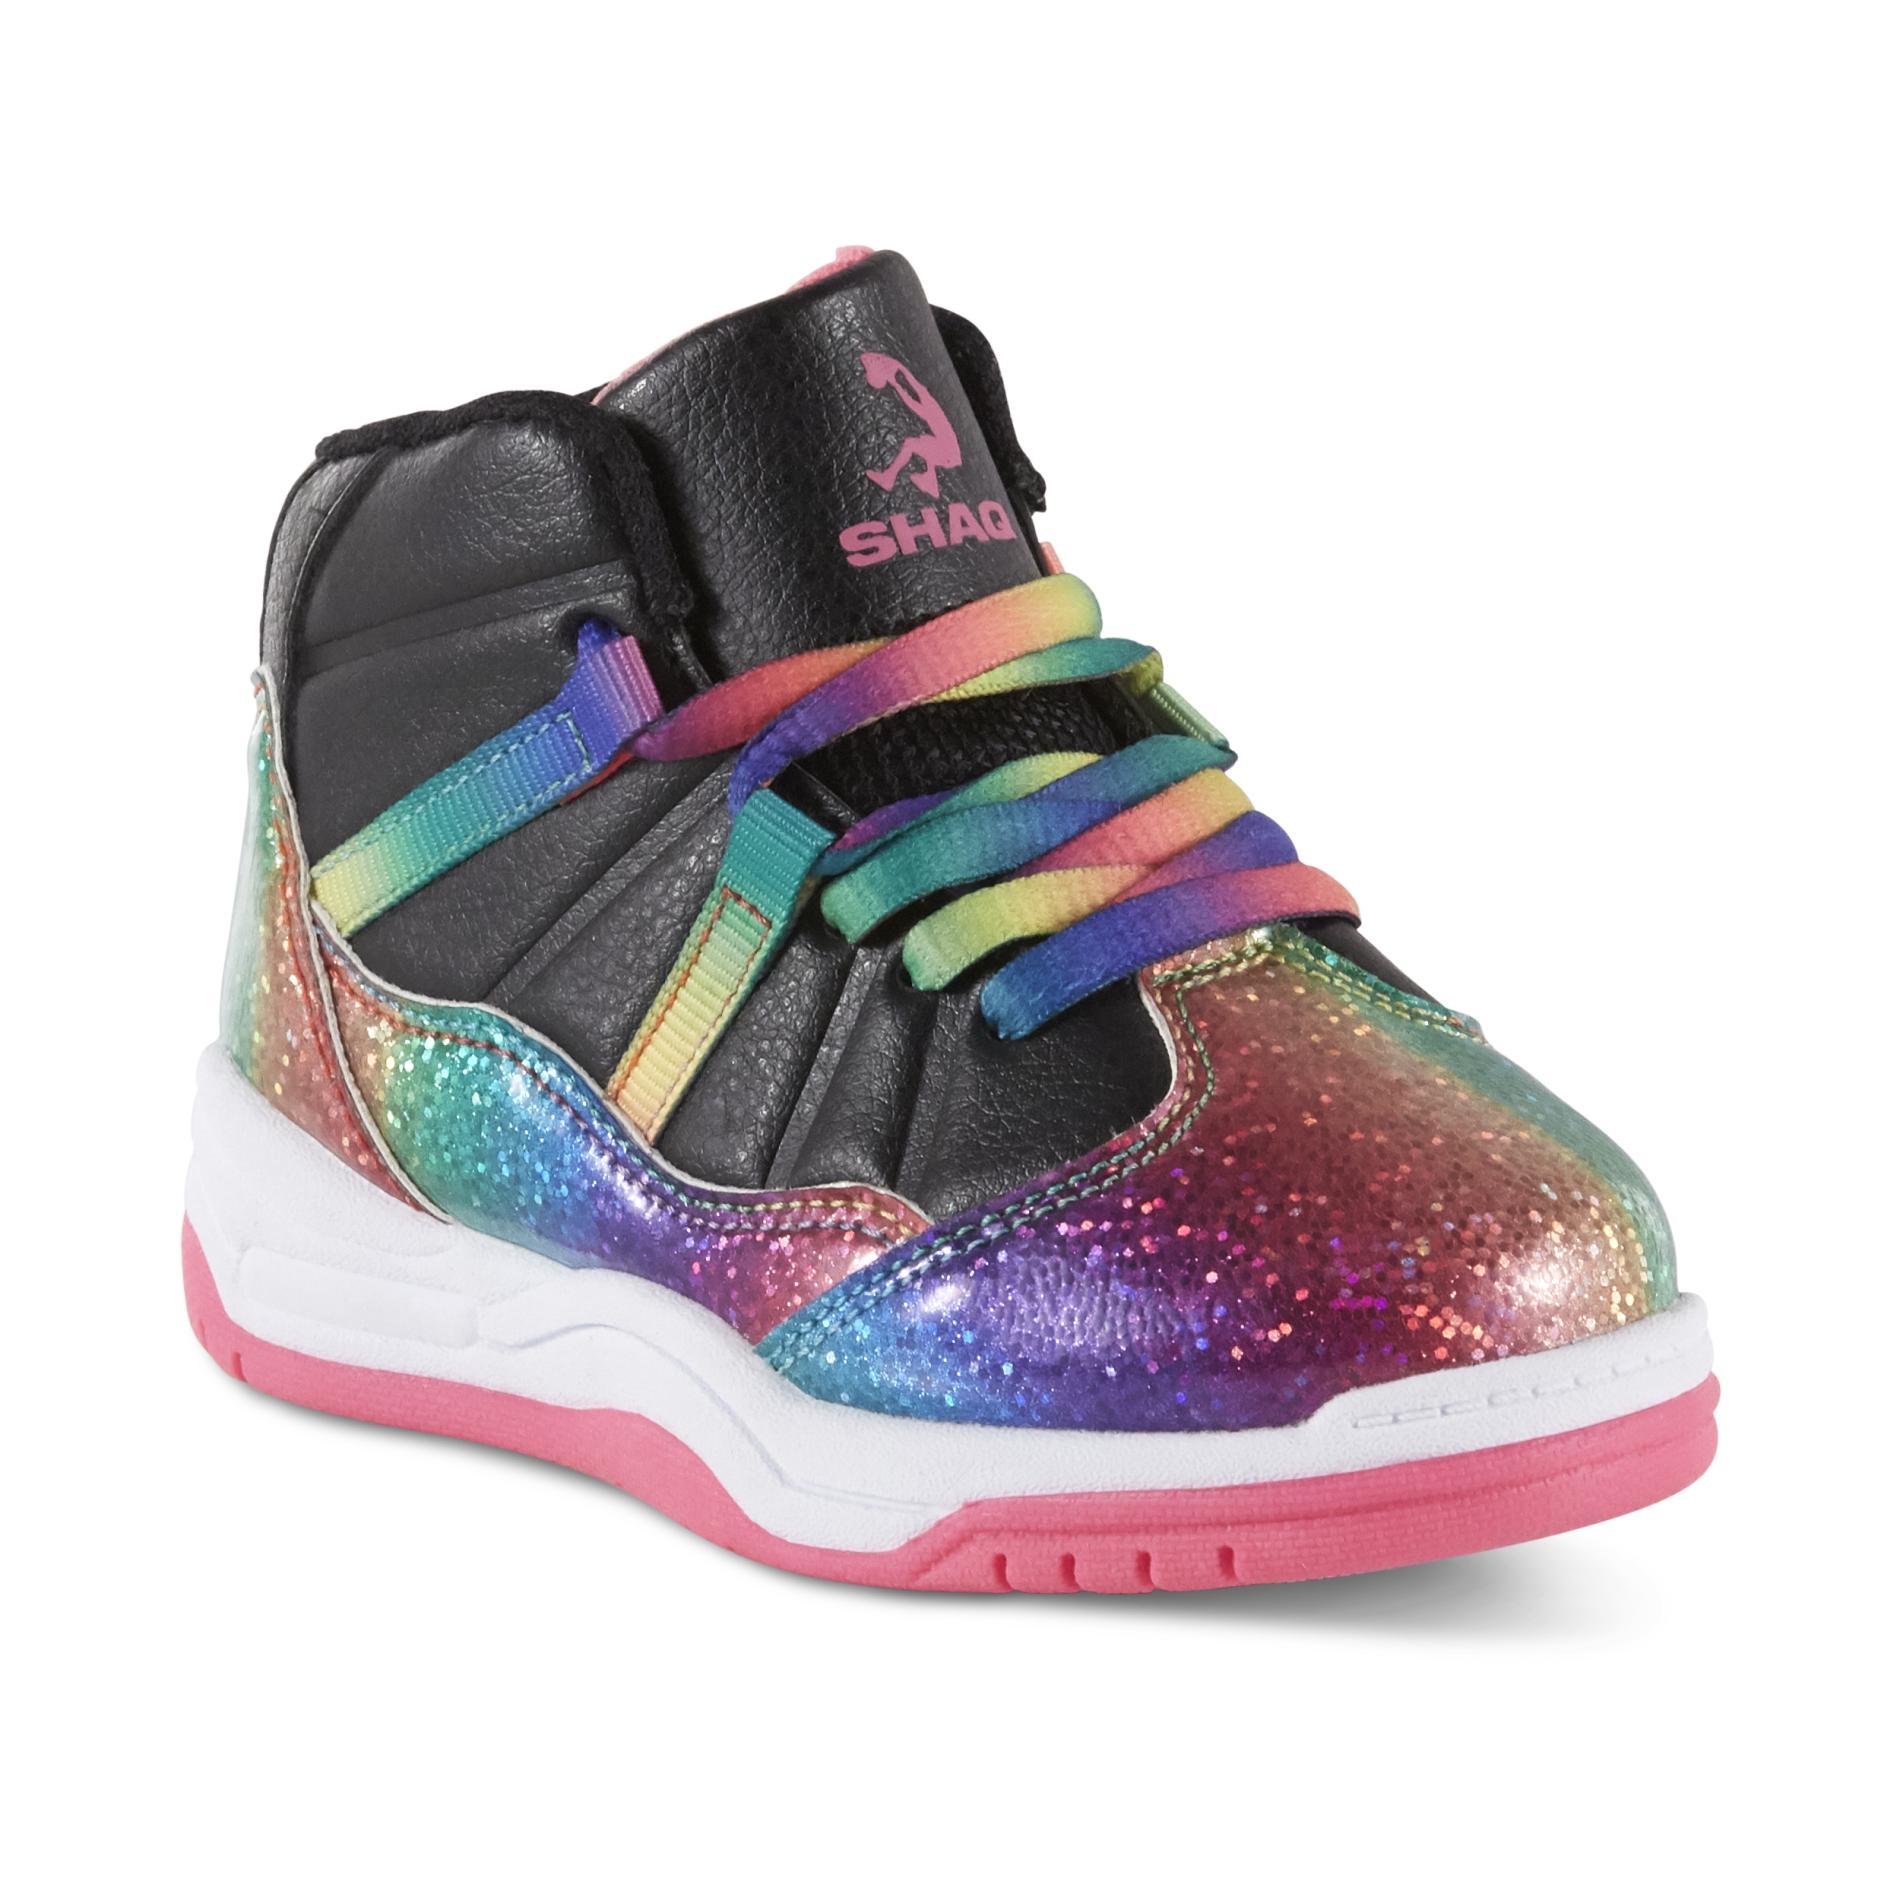 Shaq High Top Shoes